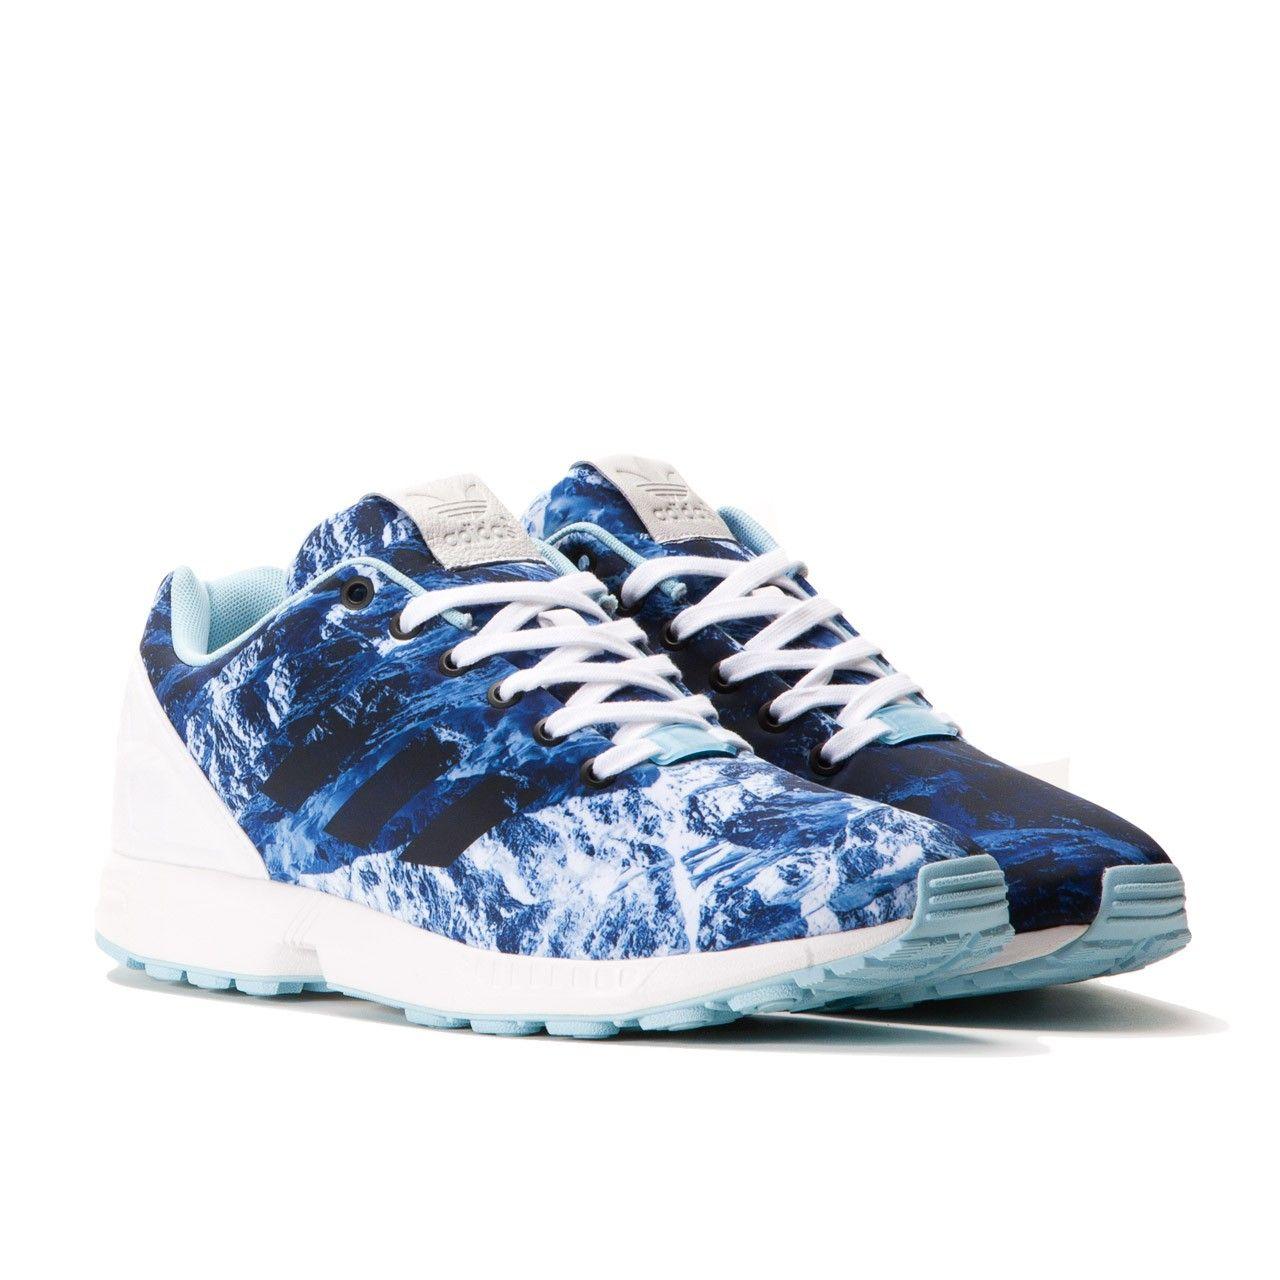 Adidas ZX Flux (Running White / Blush Blue / Core Black)